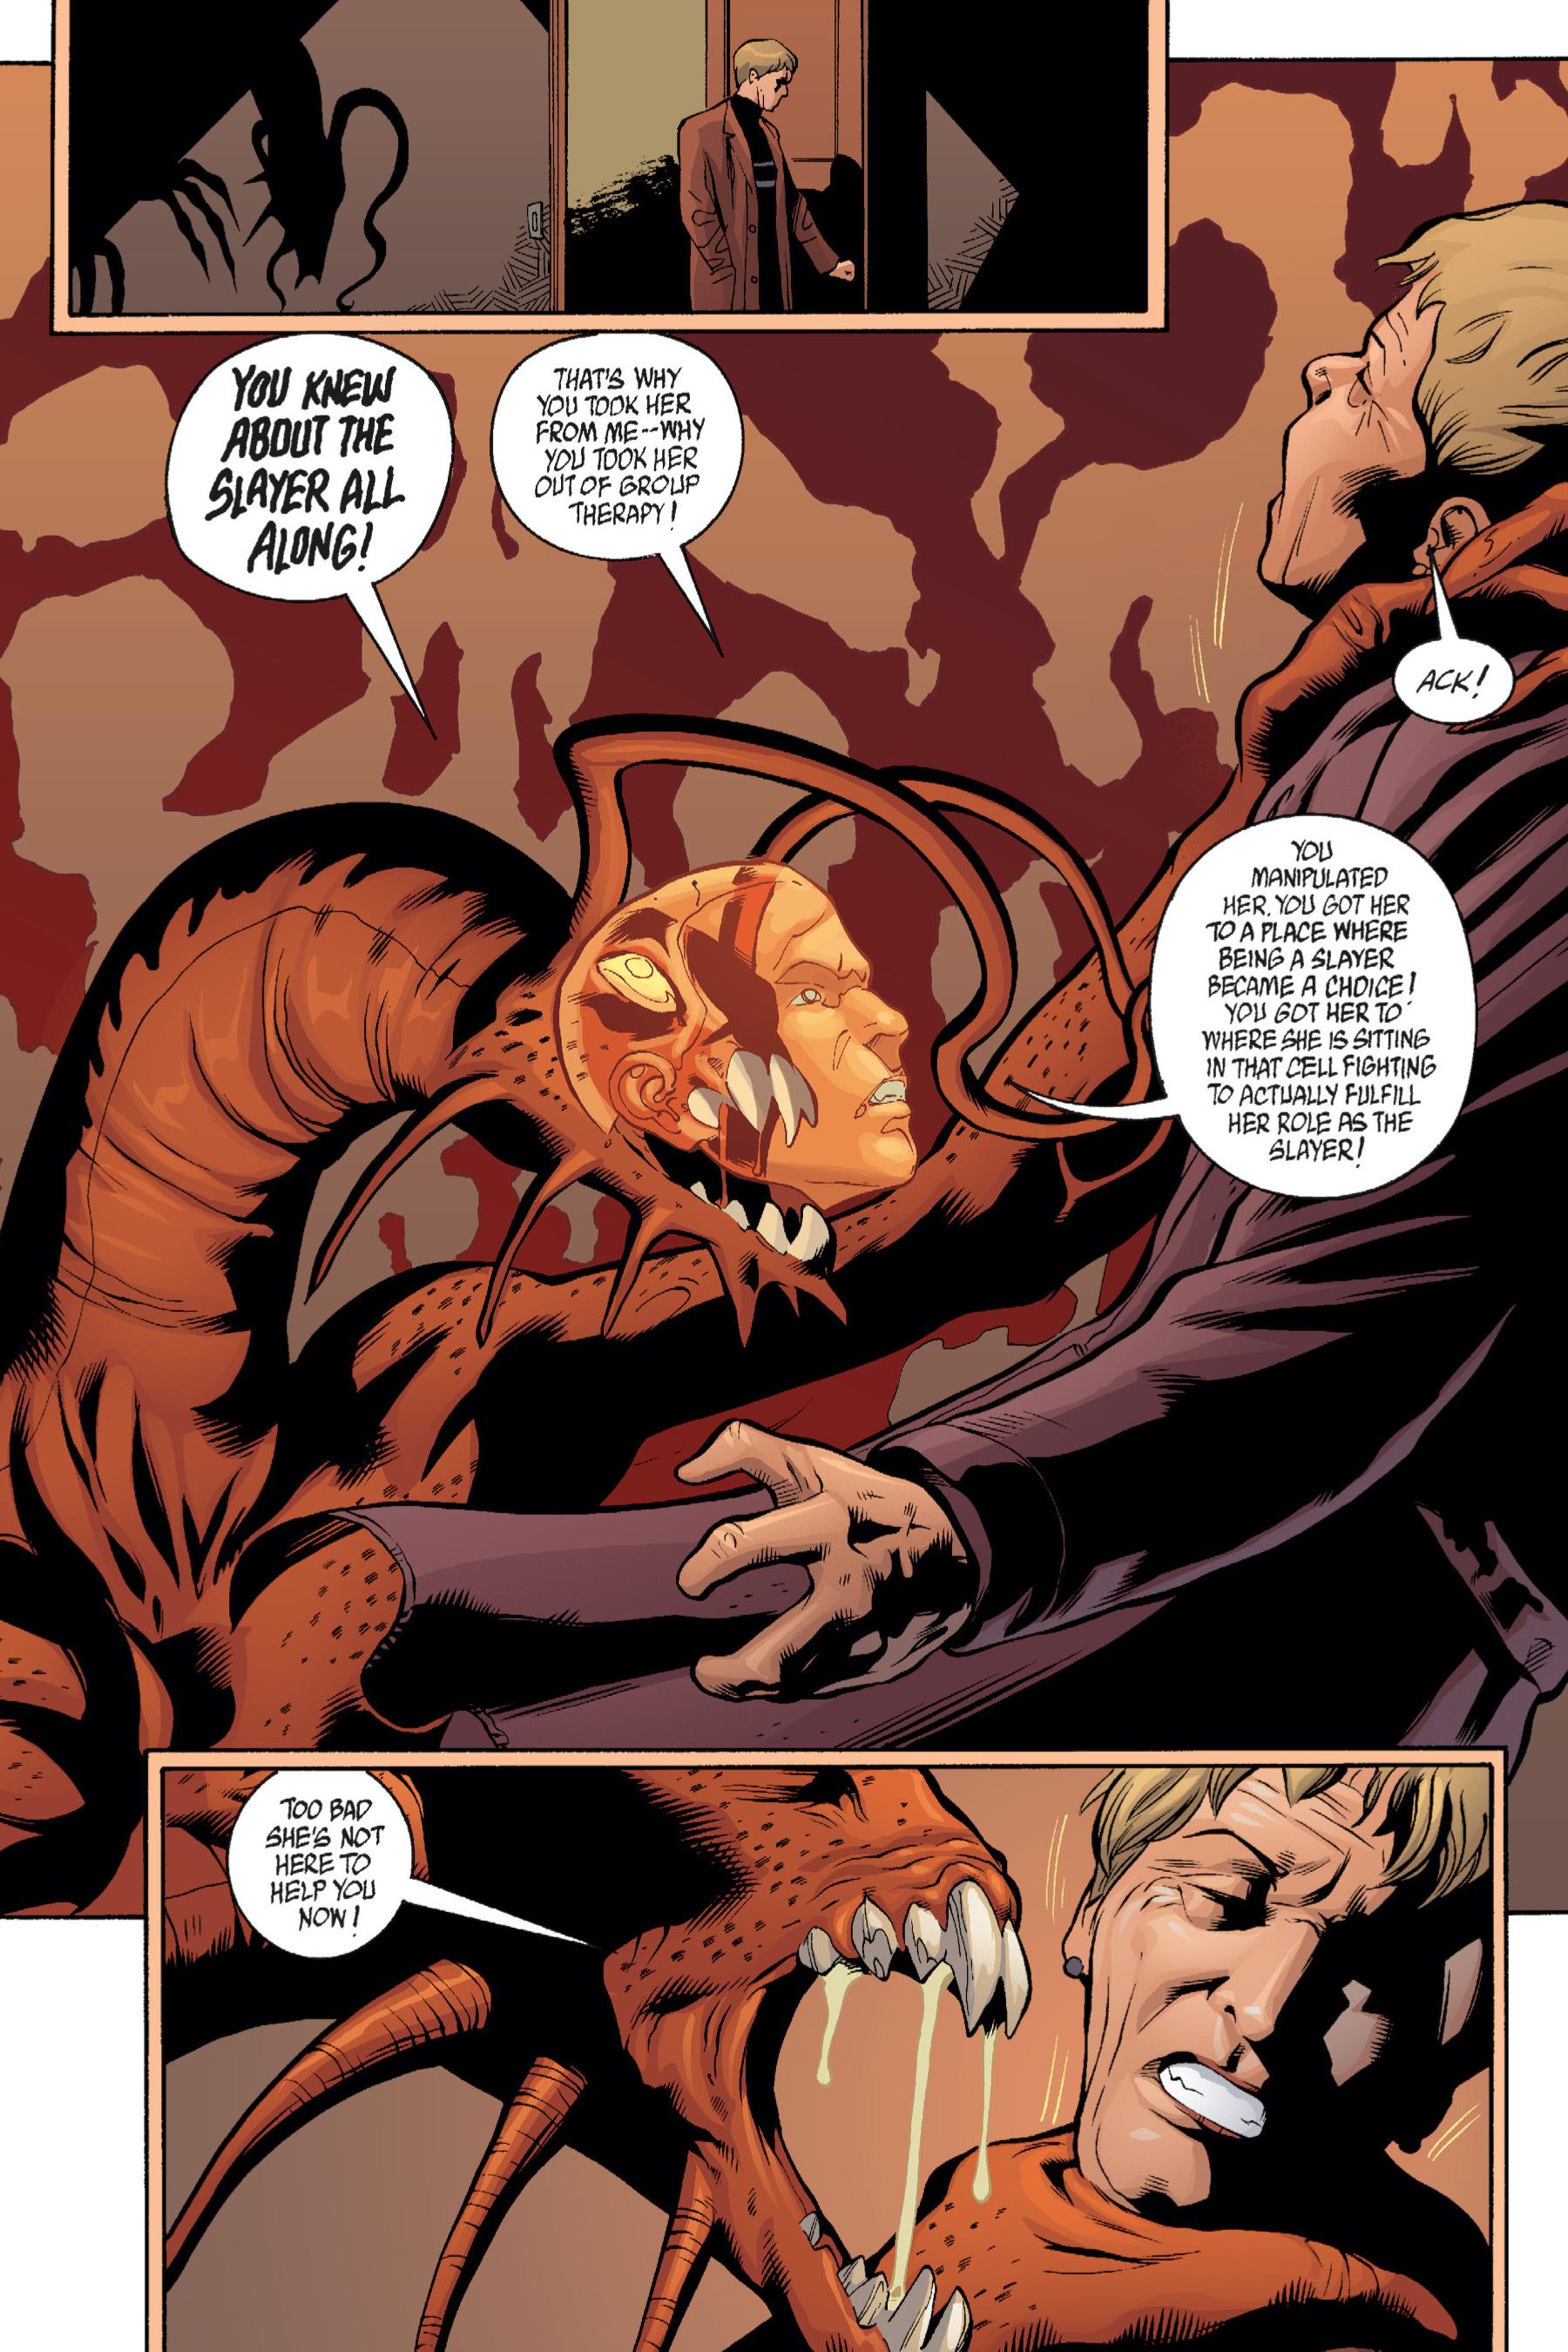 Read online Buffy the Vampire Slayer: Omnibus comic -  Issue # TPB 1 - 290